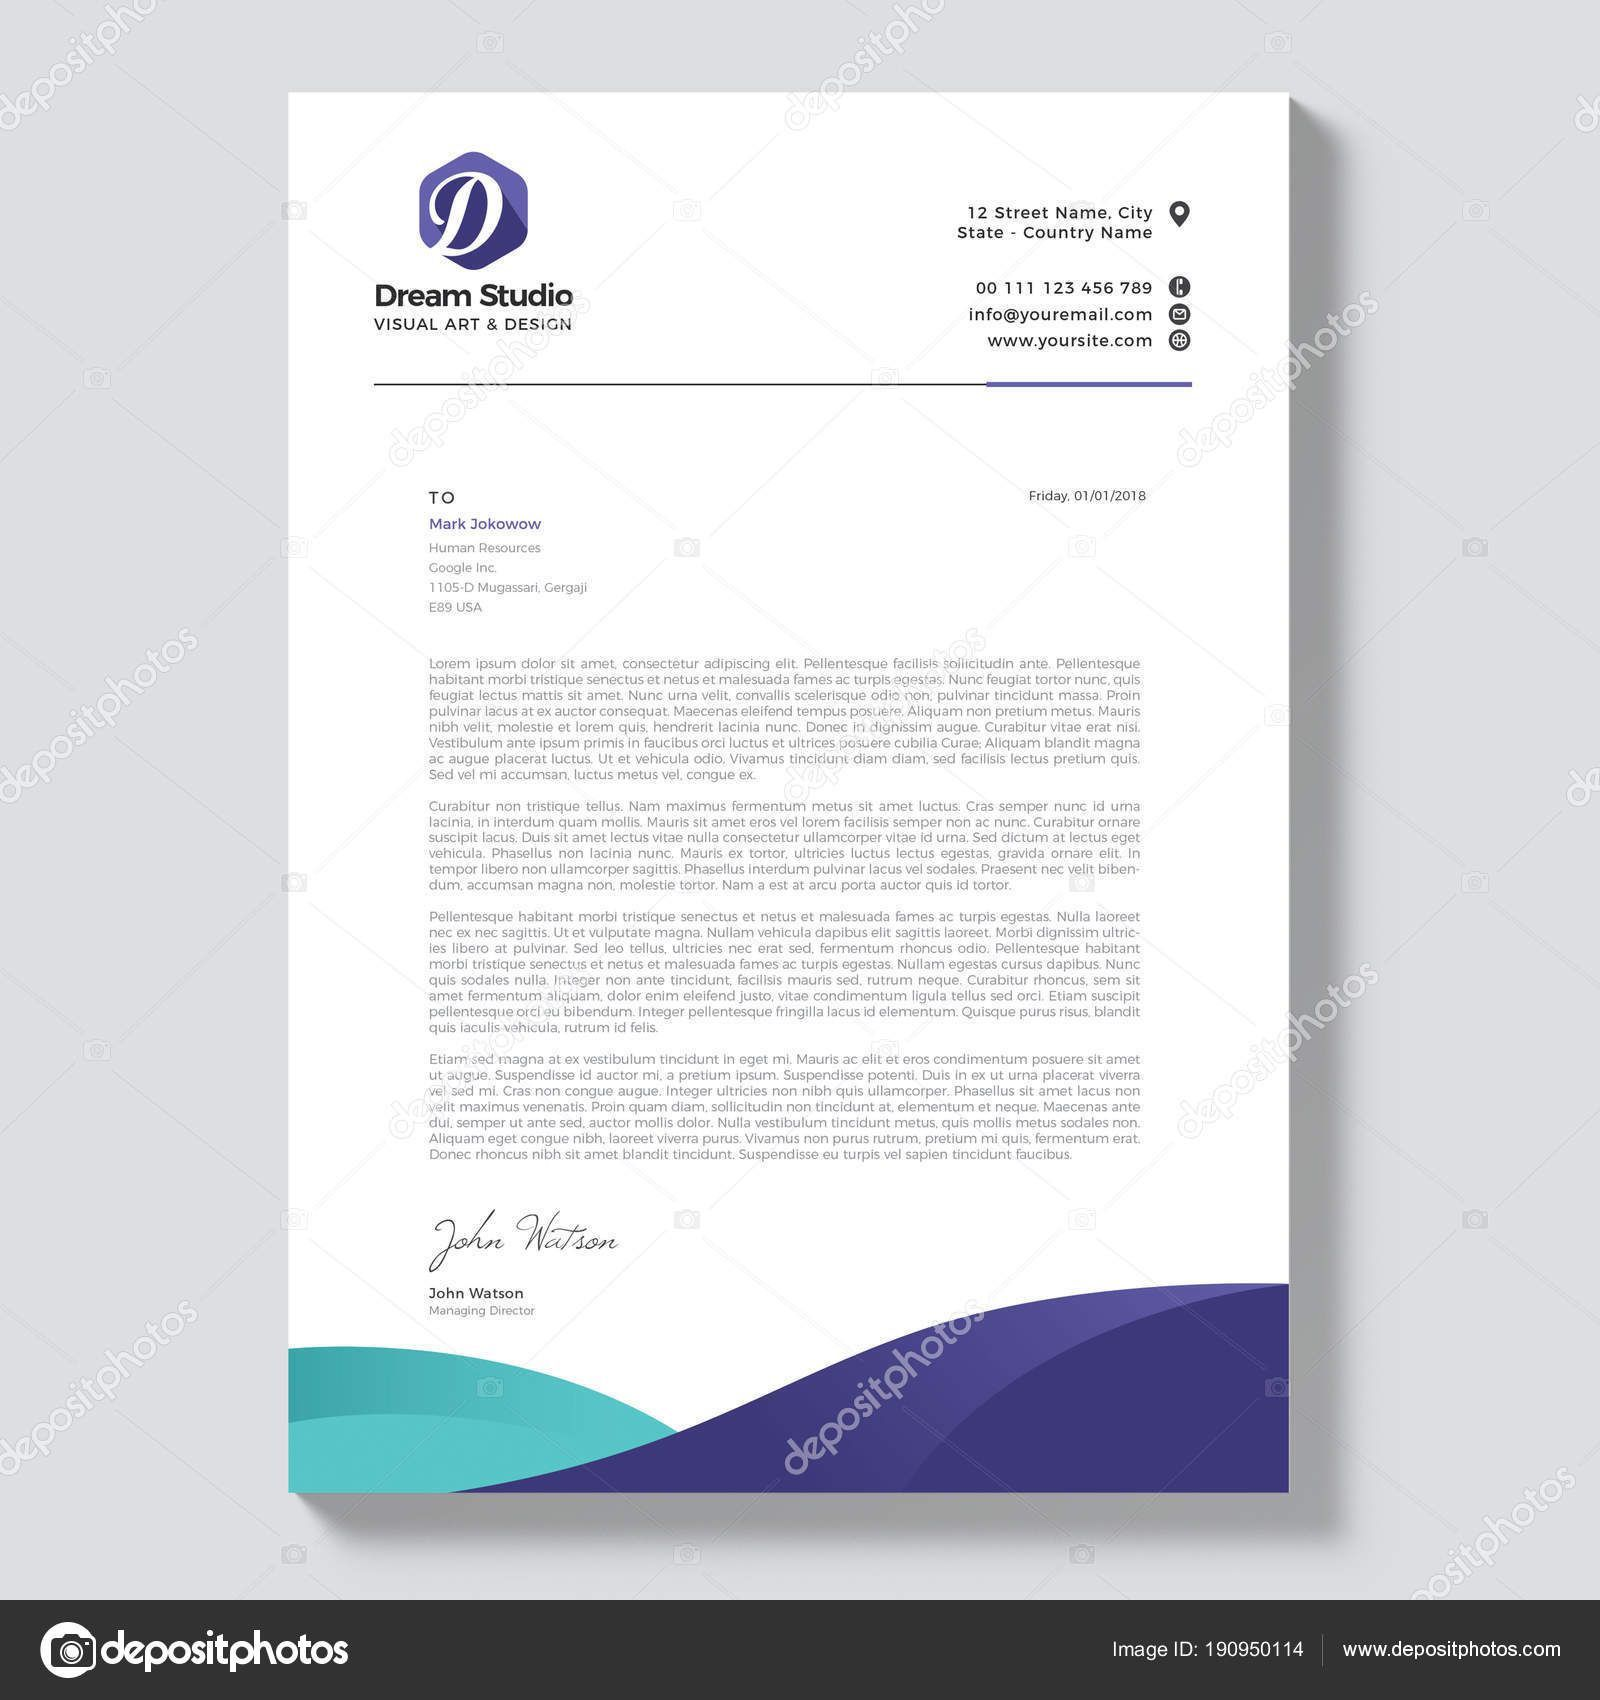 003 Beautiful Letterhead Sample Free Download  Construction Company TemplateFull